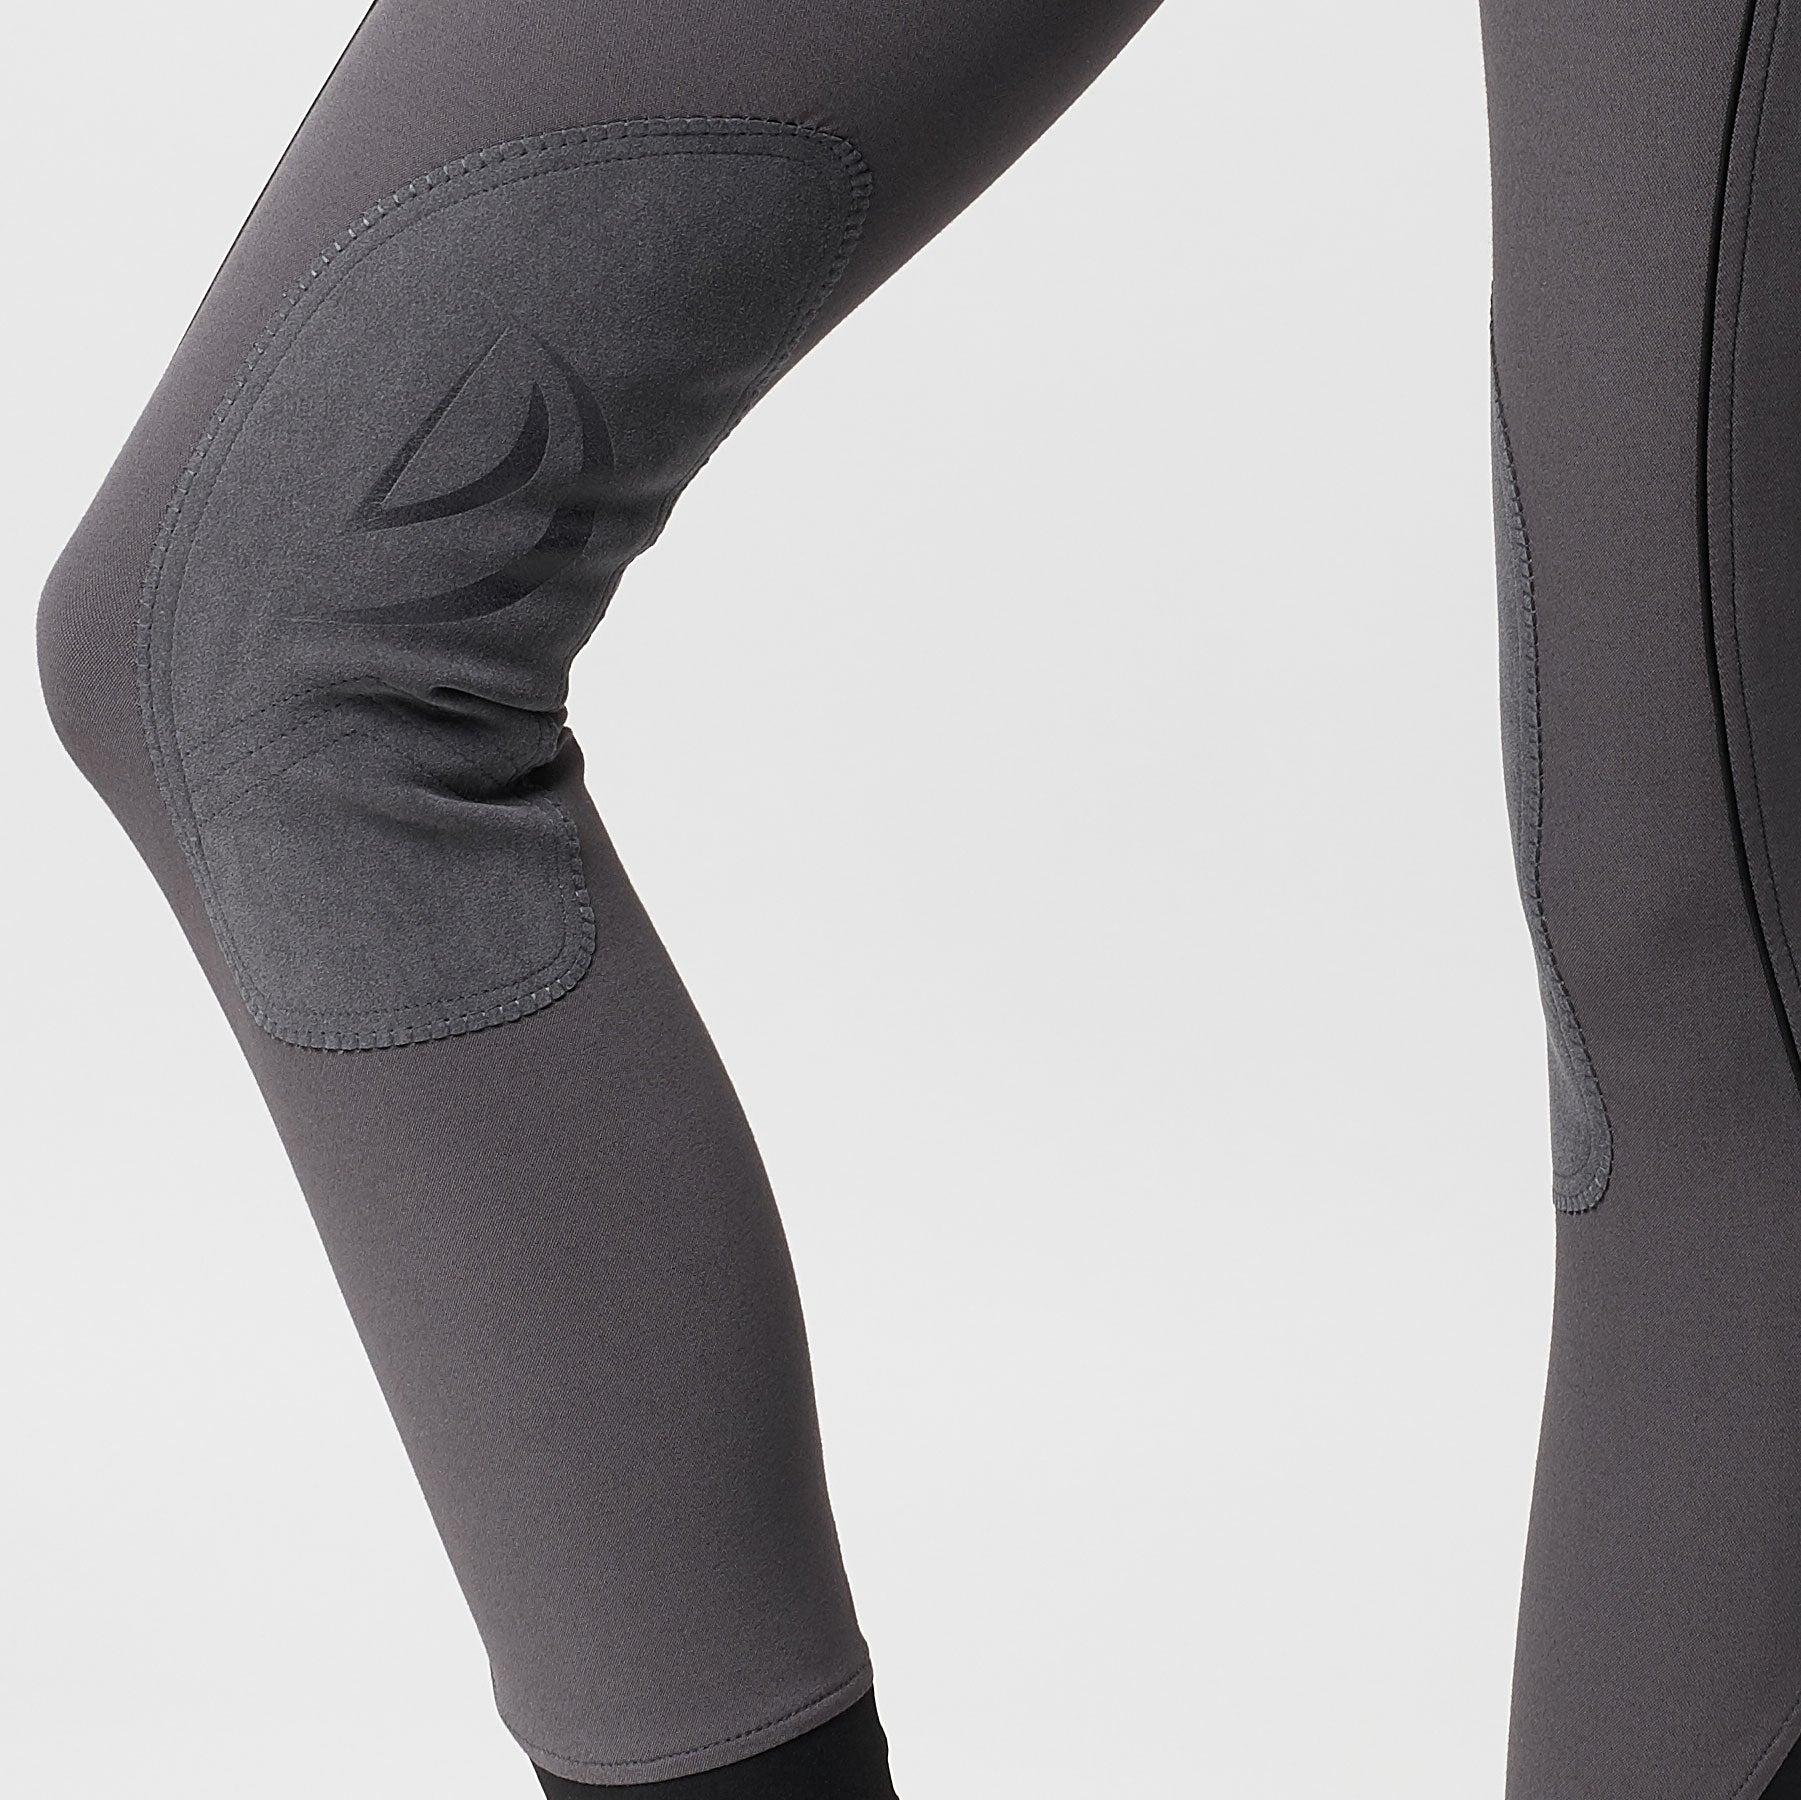 Devon Aire Signature Madrid Woven Knee Patch Breeches